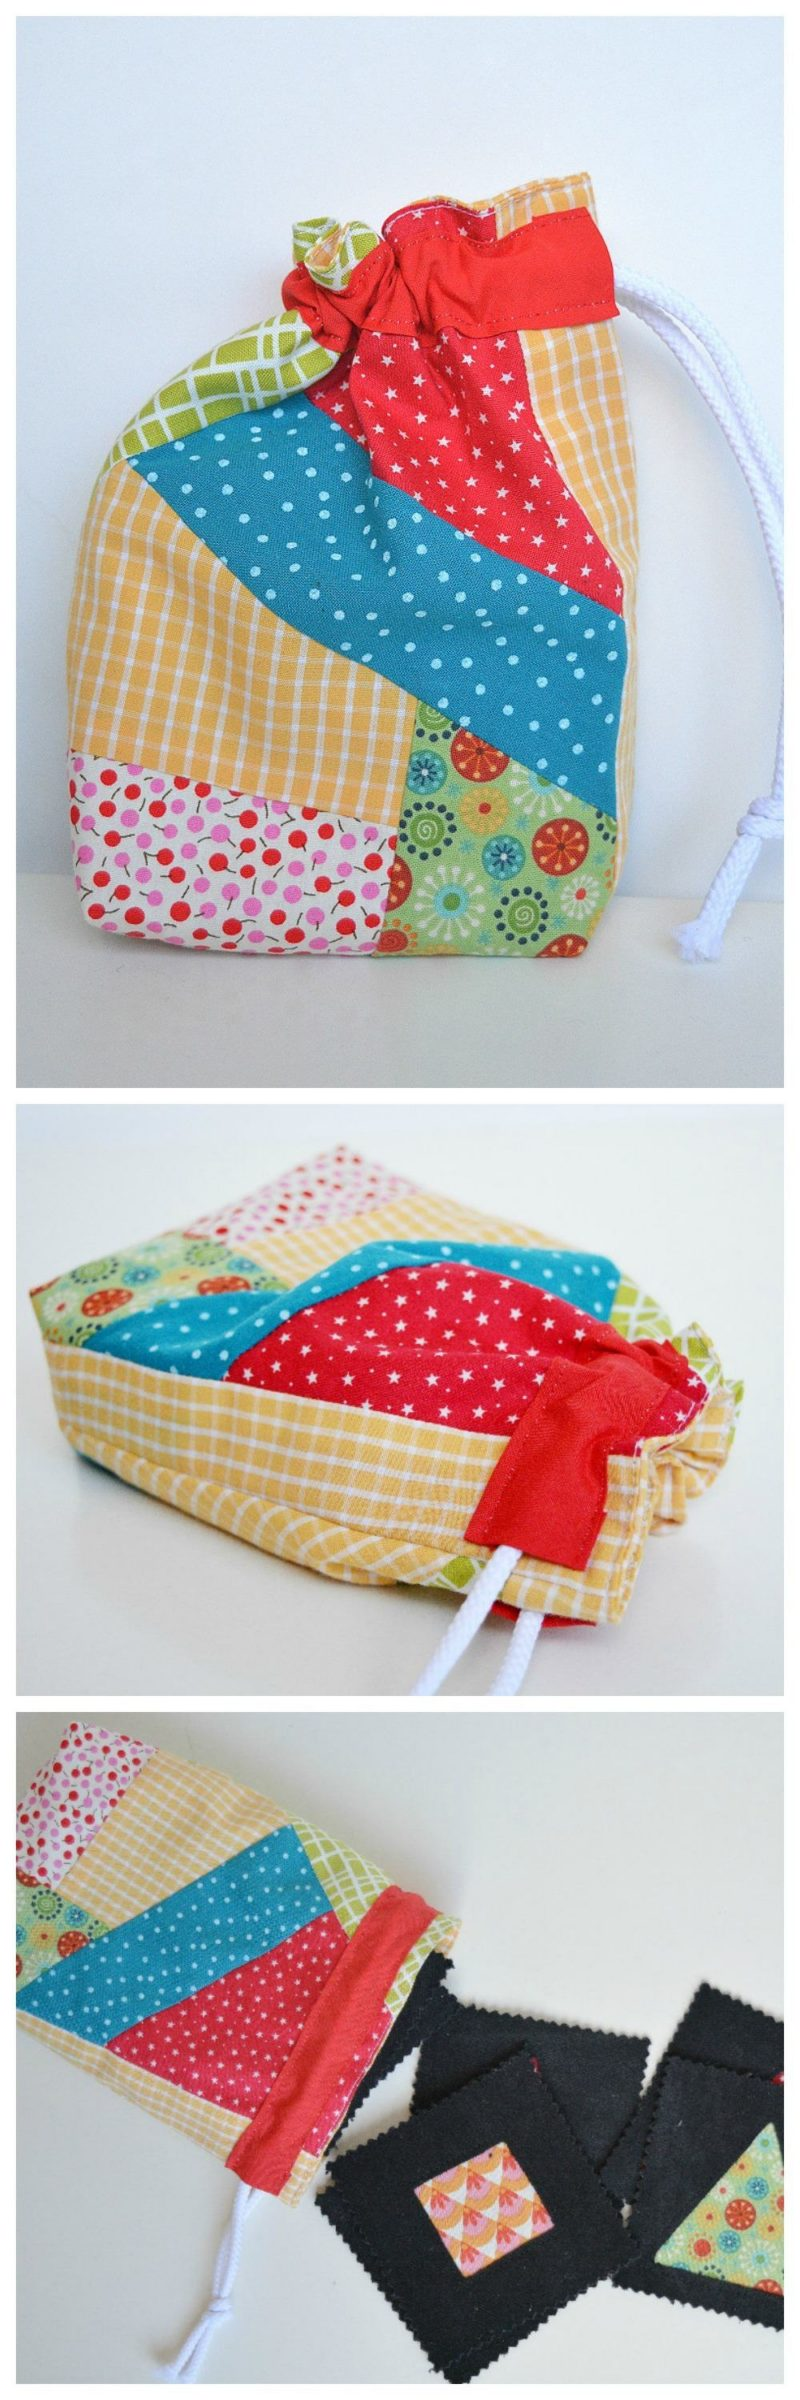 Fabric scraps as gift wrap - drawstring bag tutorial 6